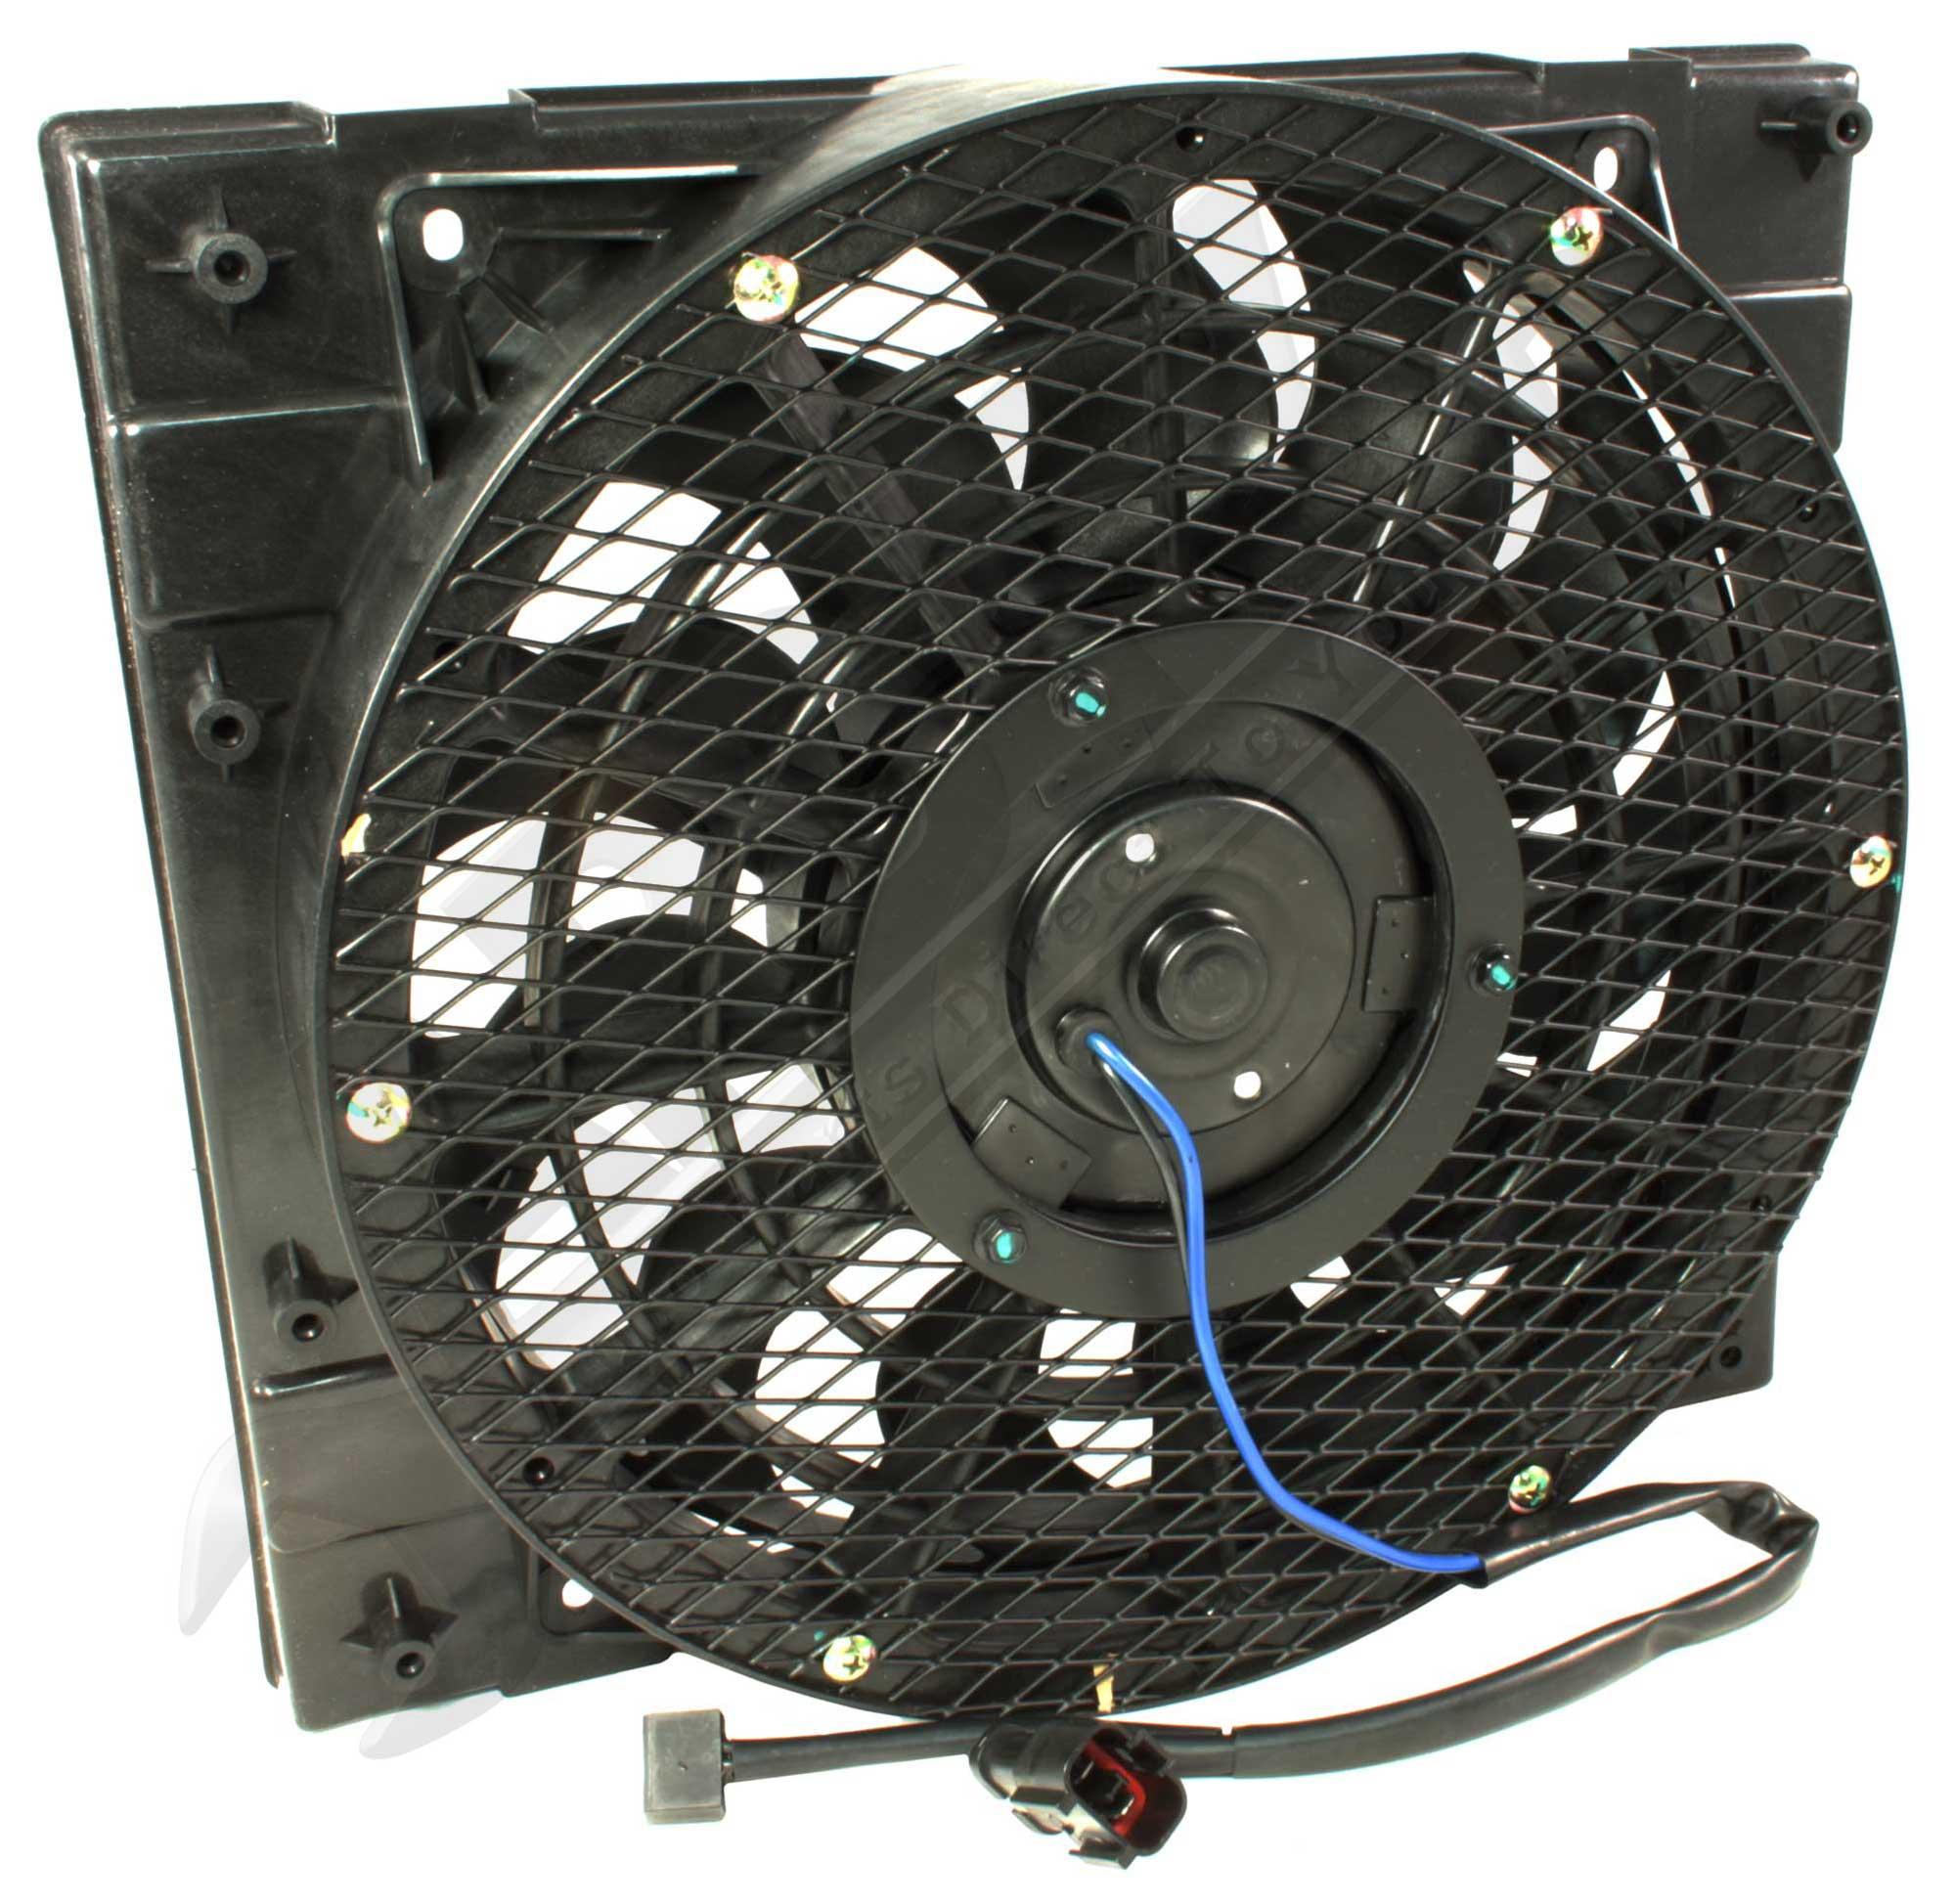 1994 2010 isuzu npr npr hd nqr ac condenser cooling fan. Black Bedroom Furniture Sets. Home Design Ideas